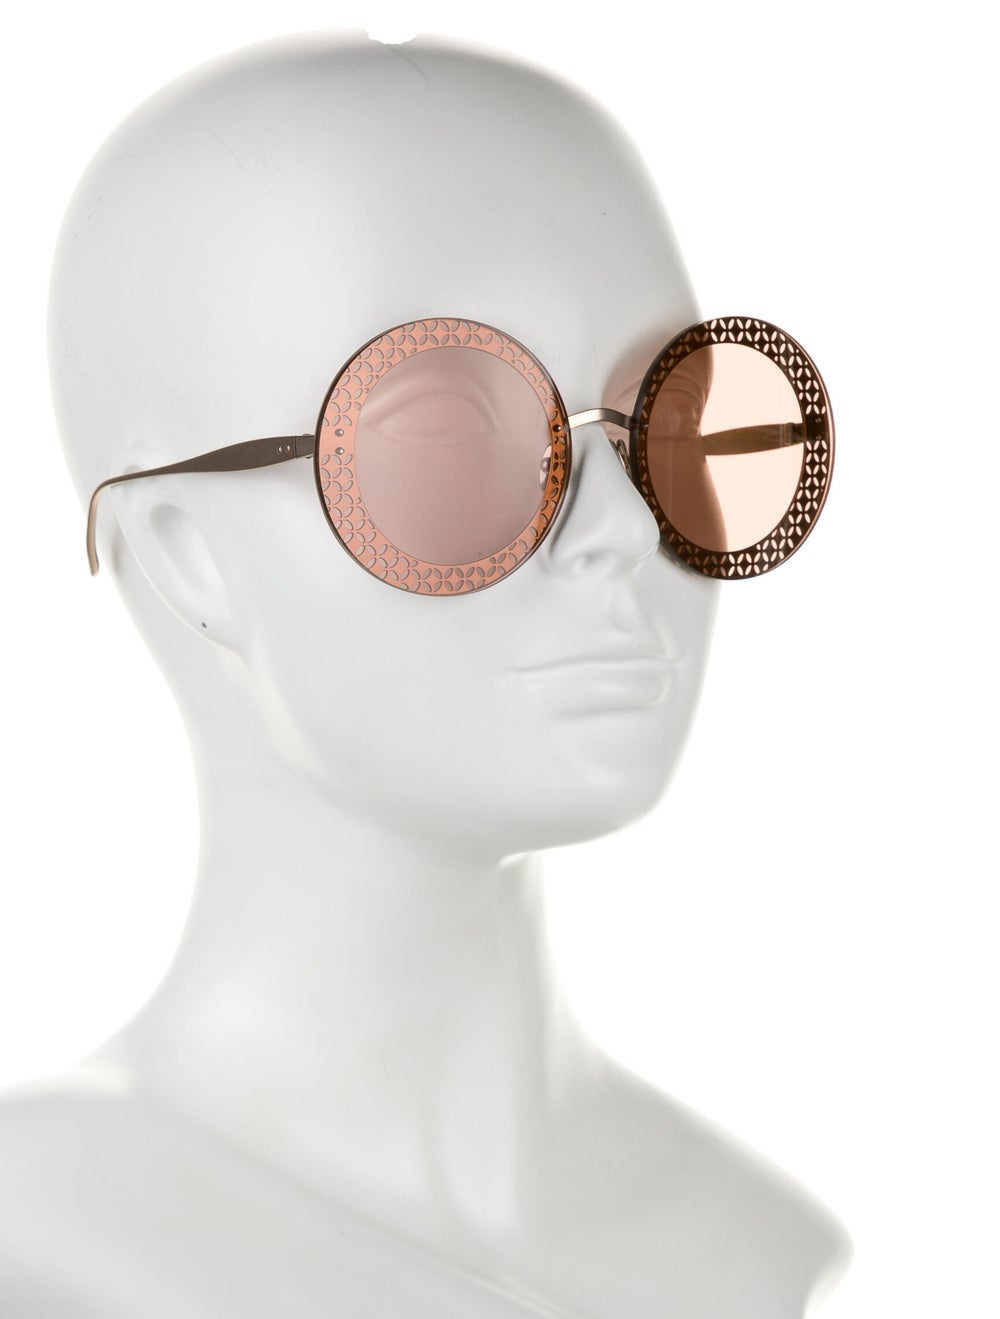 Alaïa Round Tinted Sunglasses - image 4